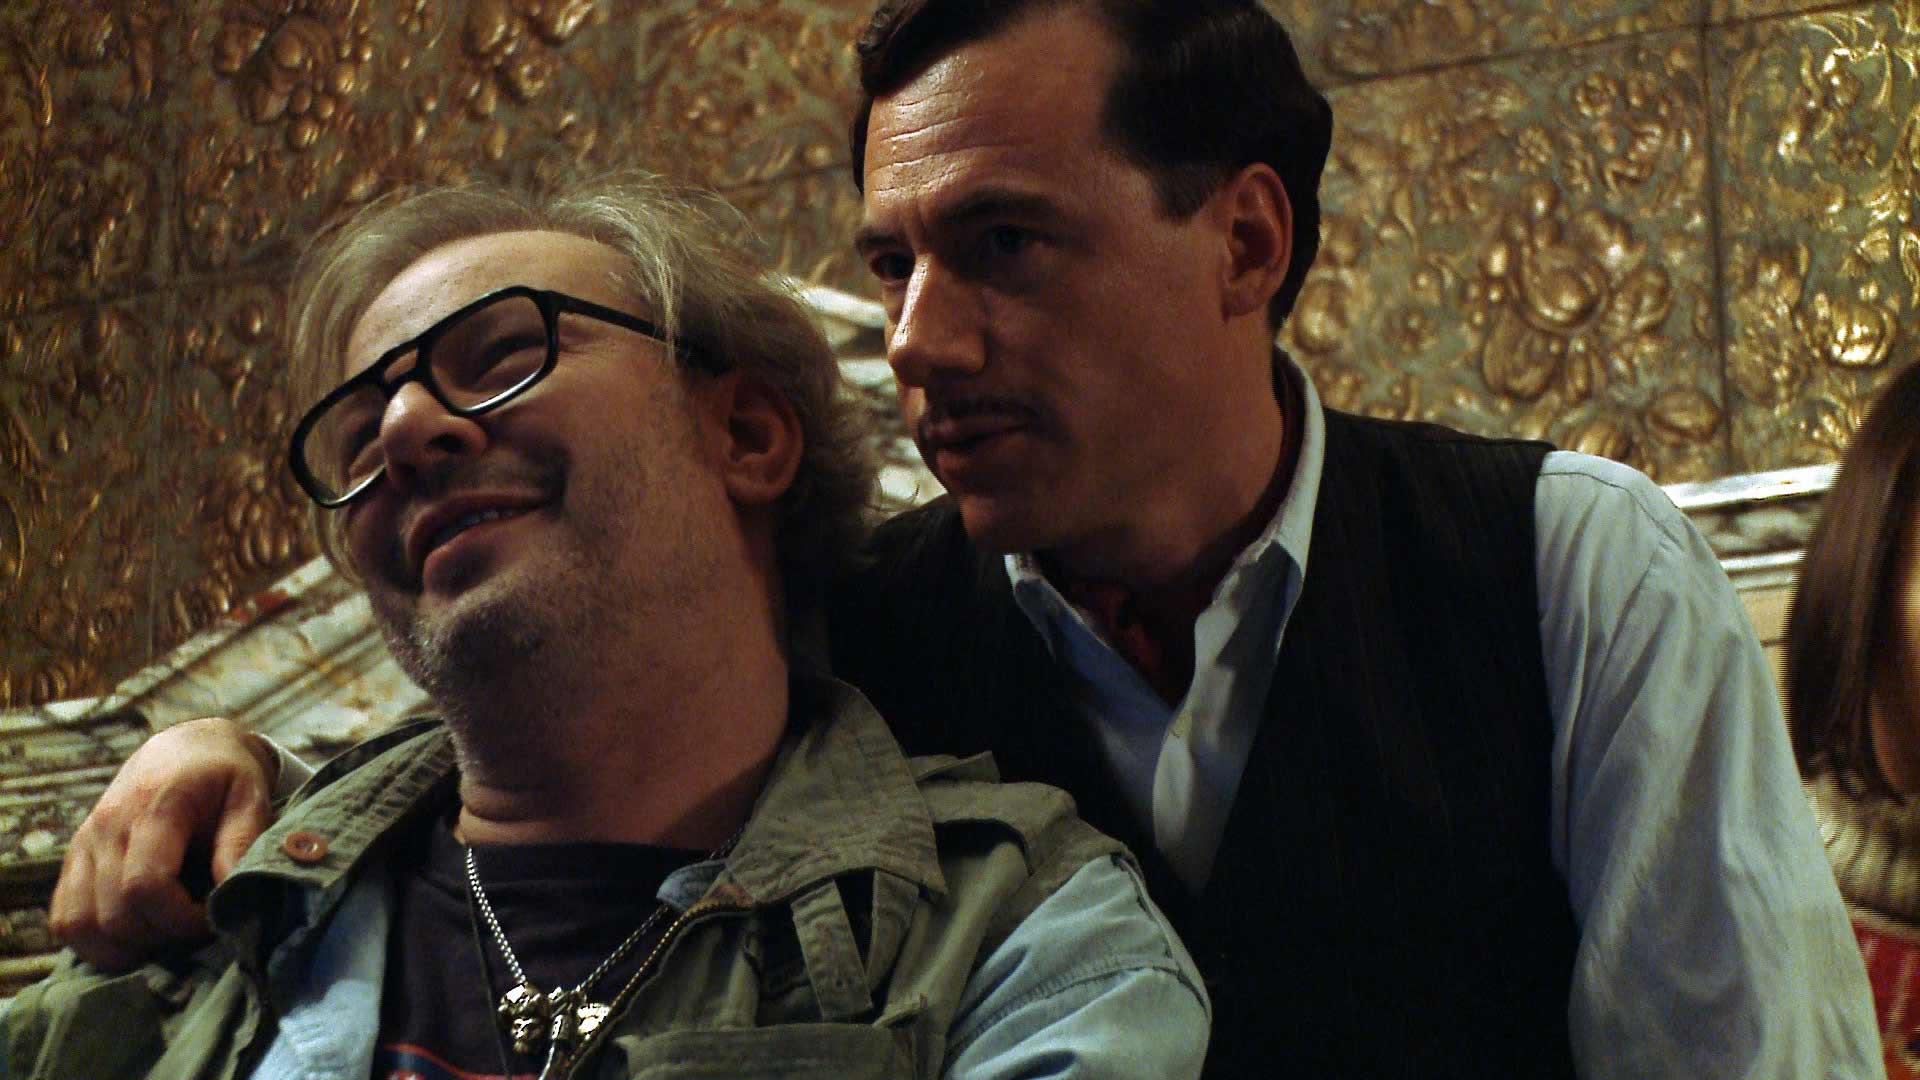 Hotel Lux - Making Of - Michael Bully Herbig umarmt Leander Haußmann